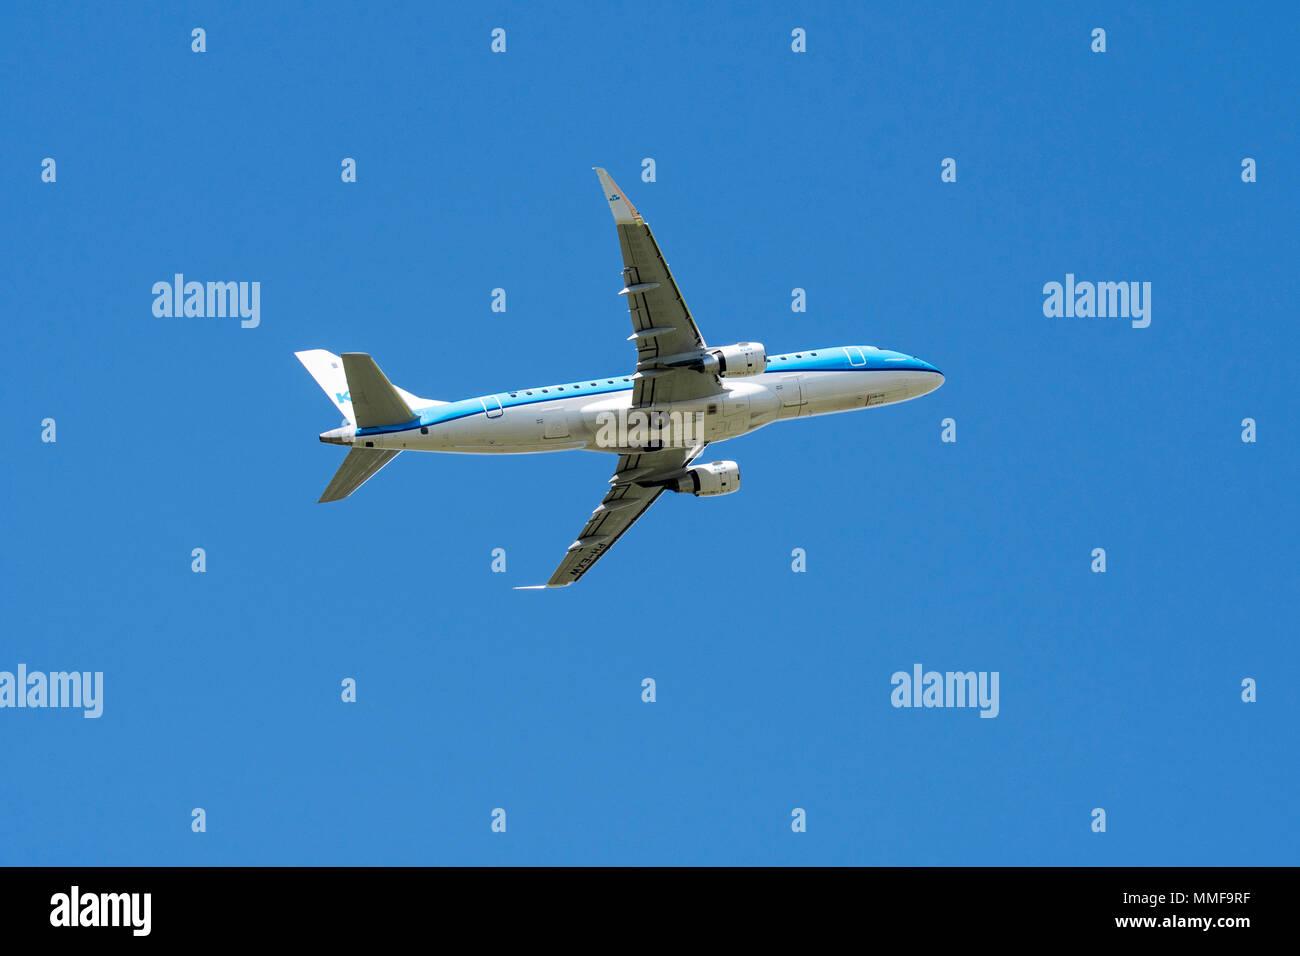 KLM Cityhopper Embraer 175, medium-range twin-engine jet airliner in flight - Stock Image